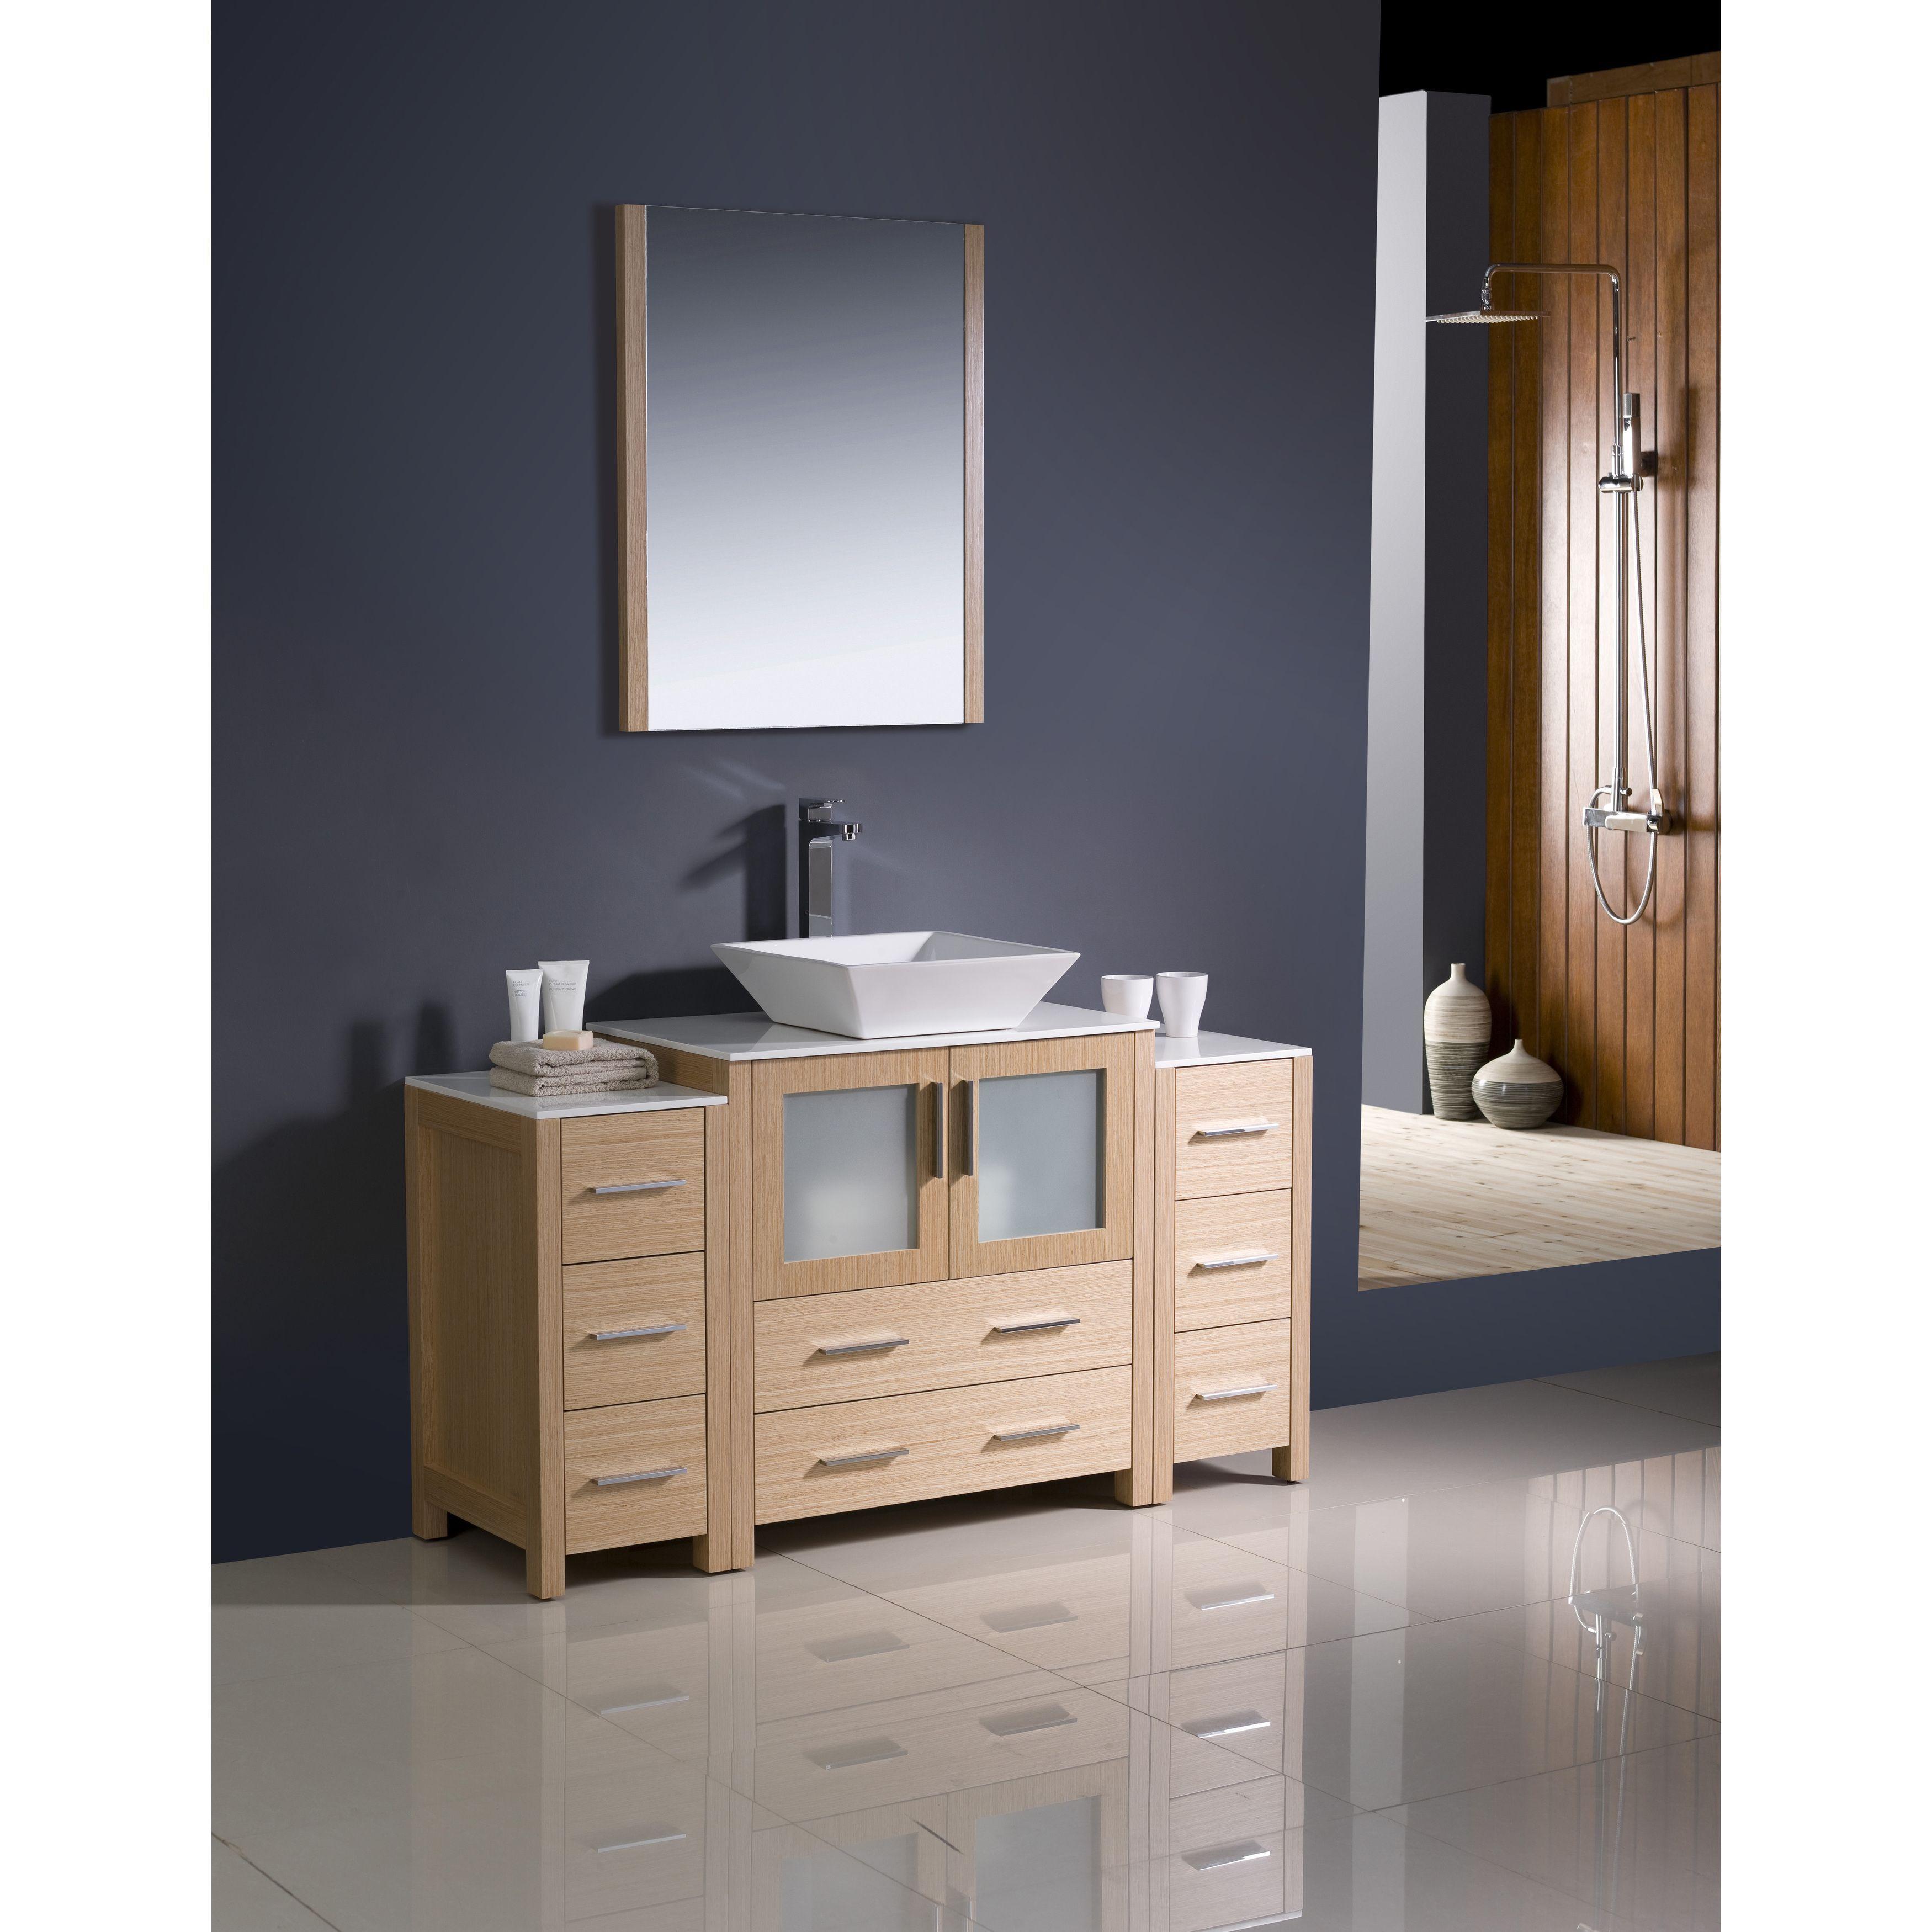 Fresca Torino 54 Inch Light Oak Modern Bathroom Vanity With 2 Side